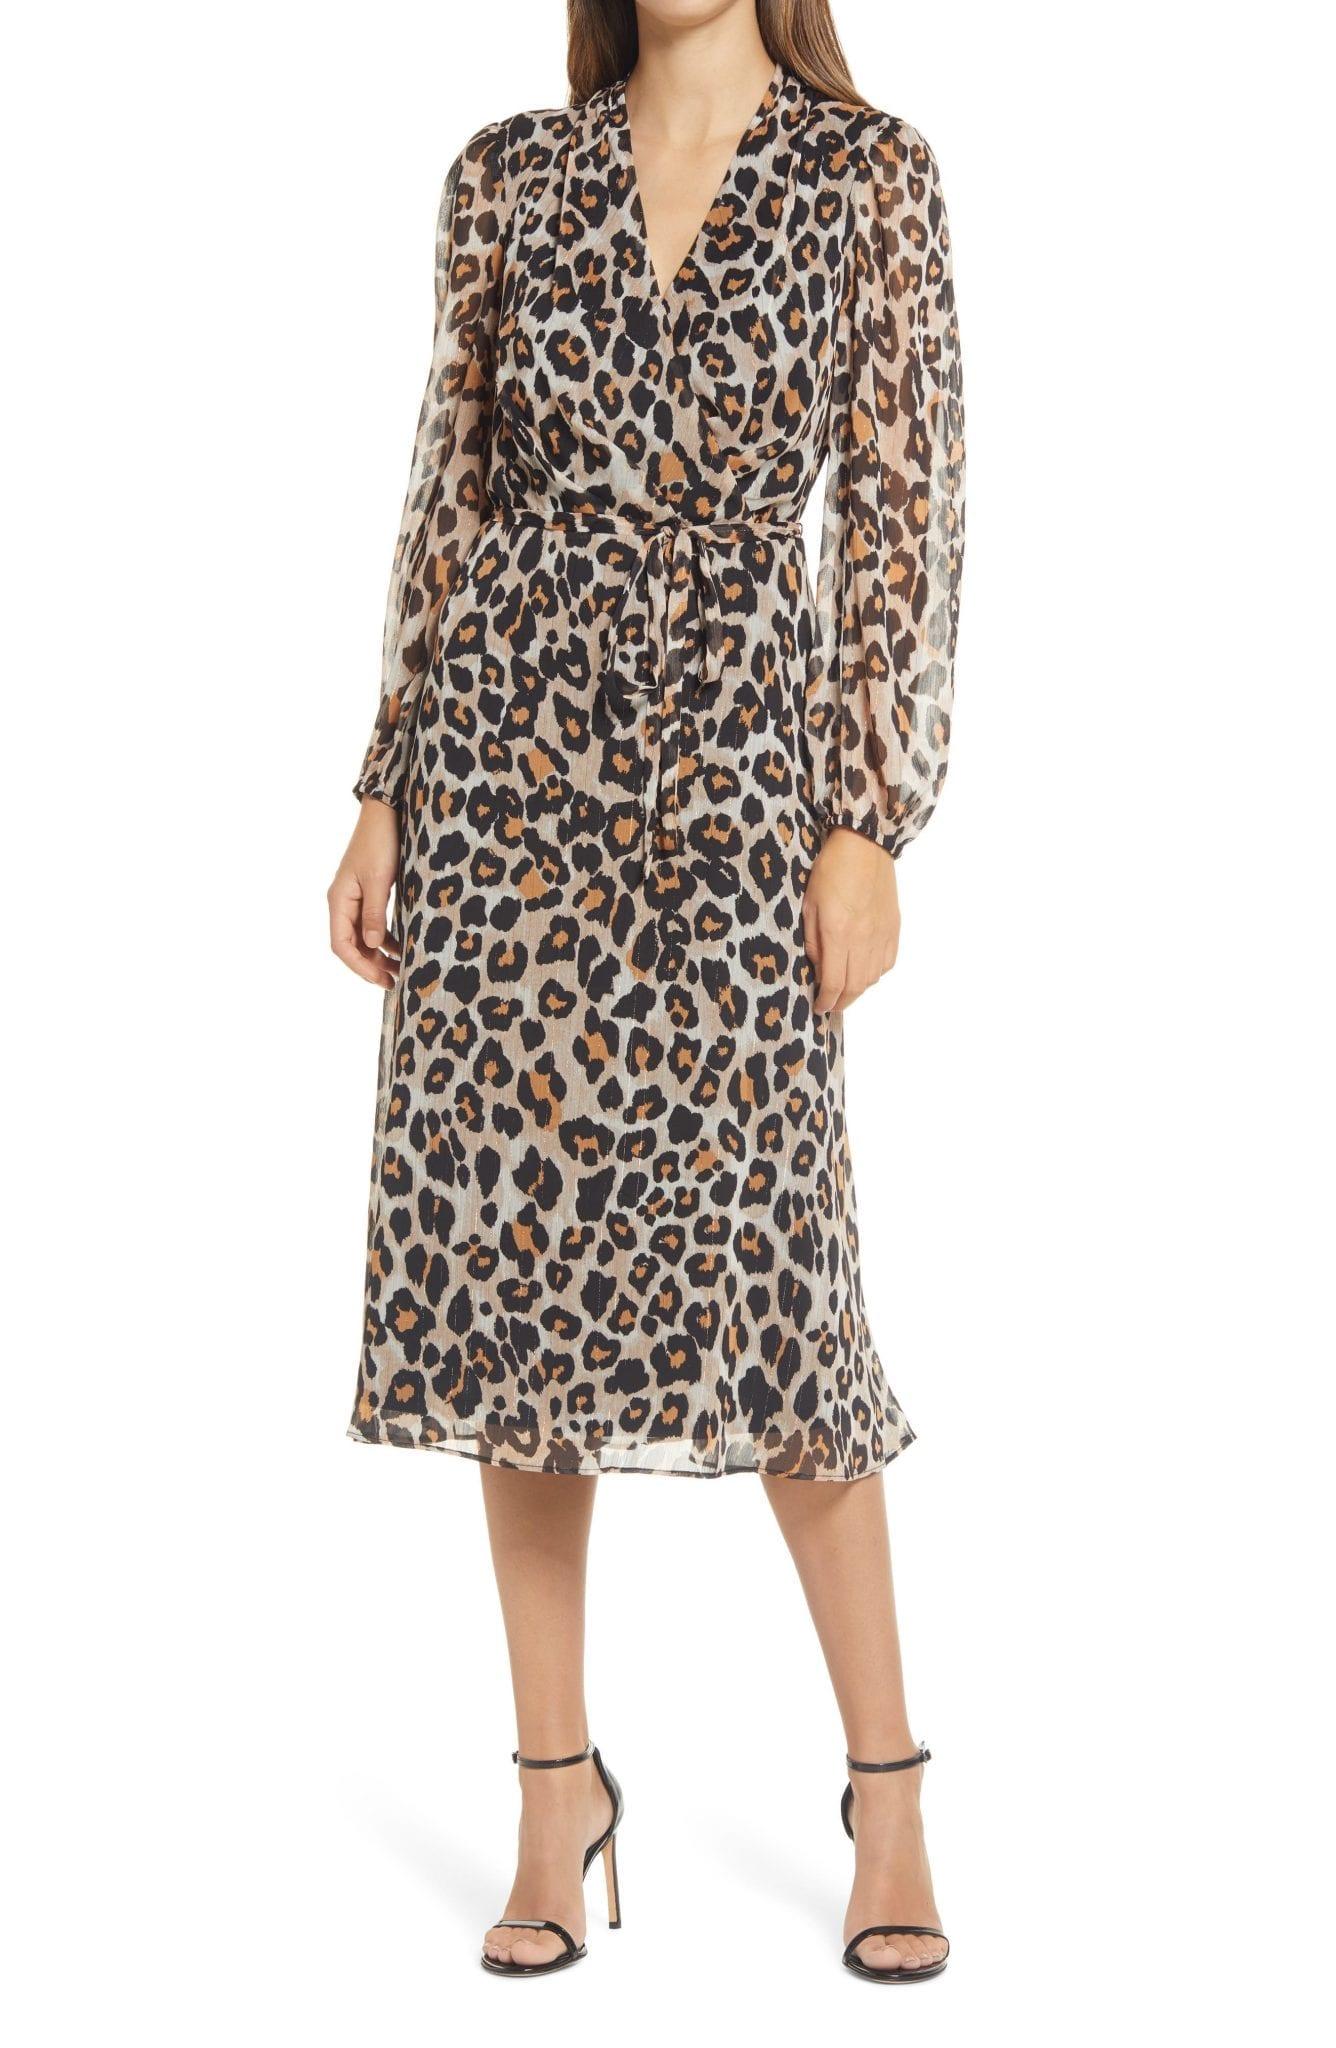 DONNA RICCO Leopard Faux Wrap Long Sleeve Dress